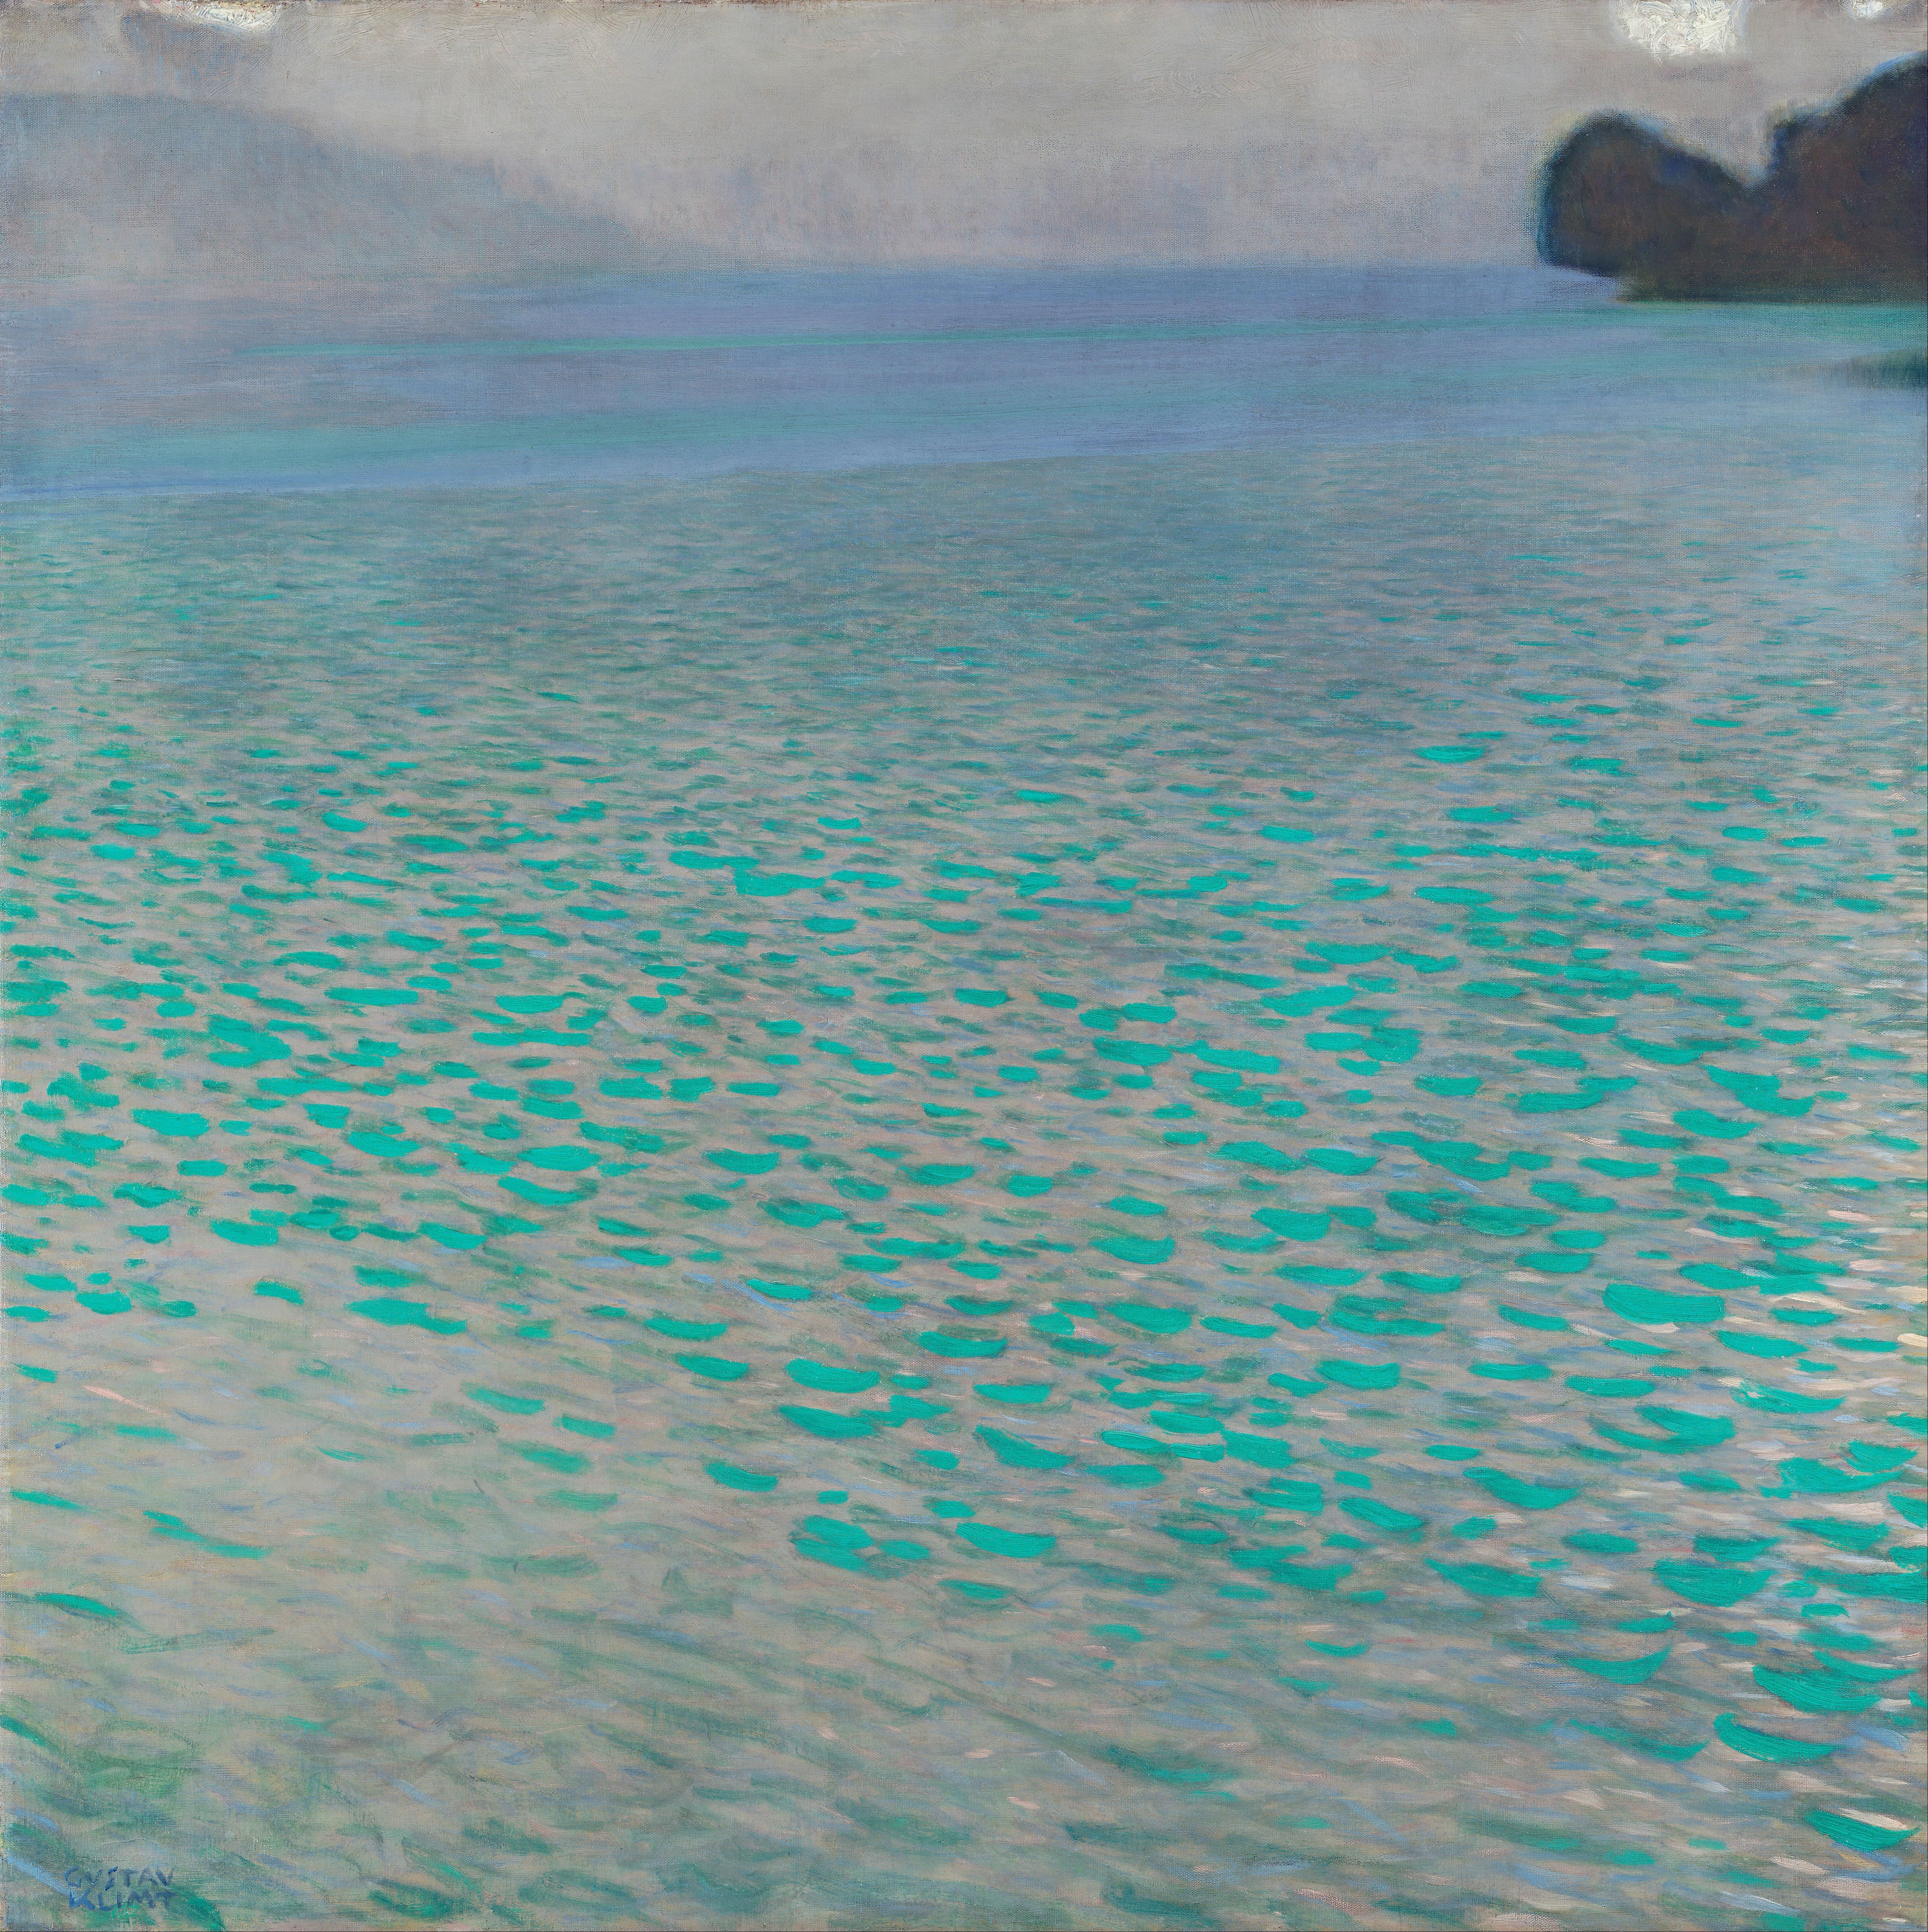 Musique et Image Gustav_Klimt_-_Attersee_-_Google_Art_Project